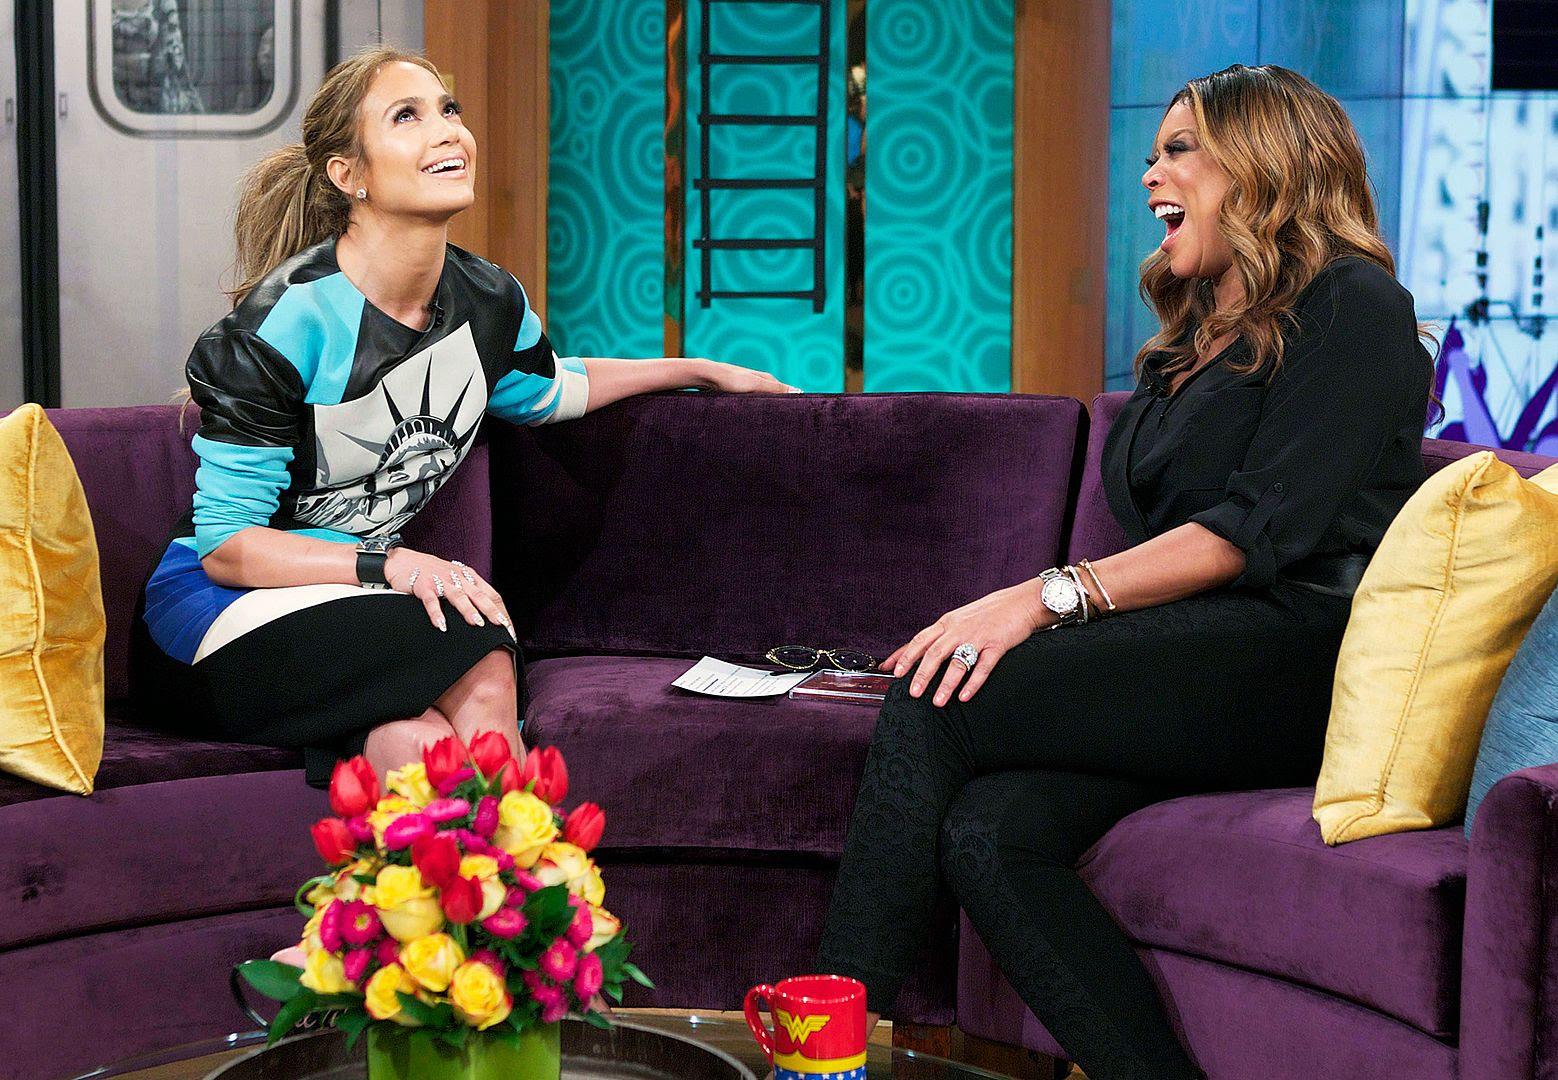 Jennifer Lopez : Wendy Williams (June 2014) photo 1403187489_jennifer-lopez-wendy-williams-zoom.jpg